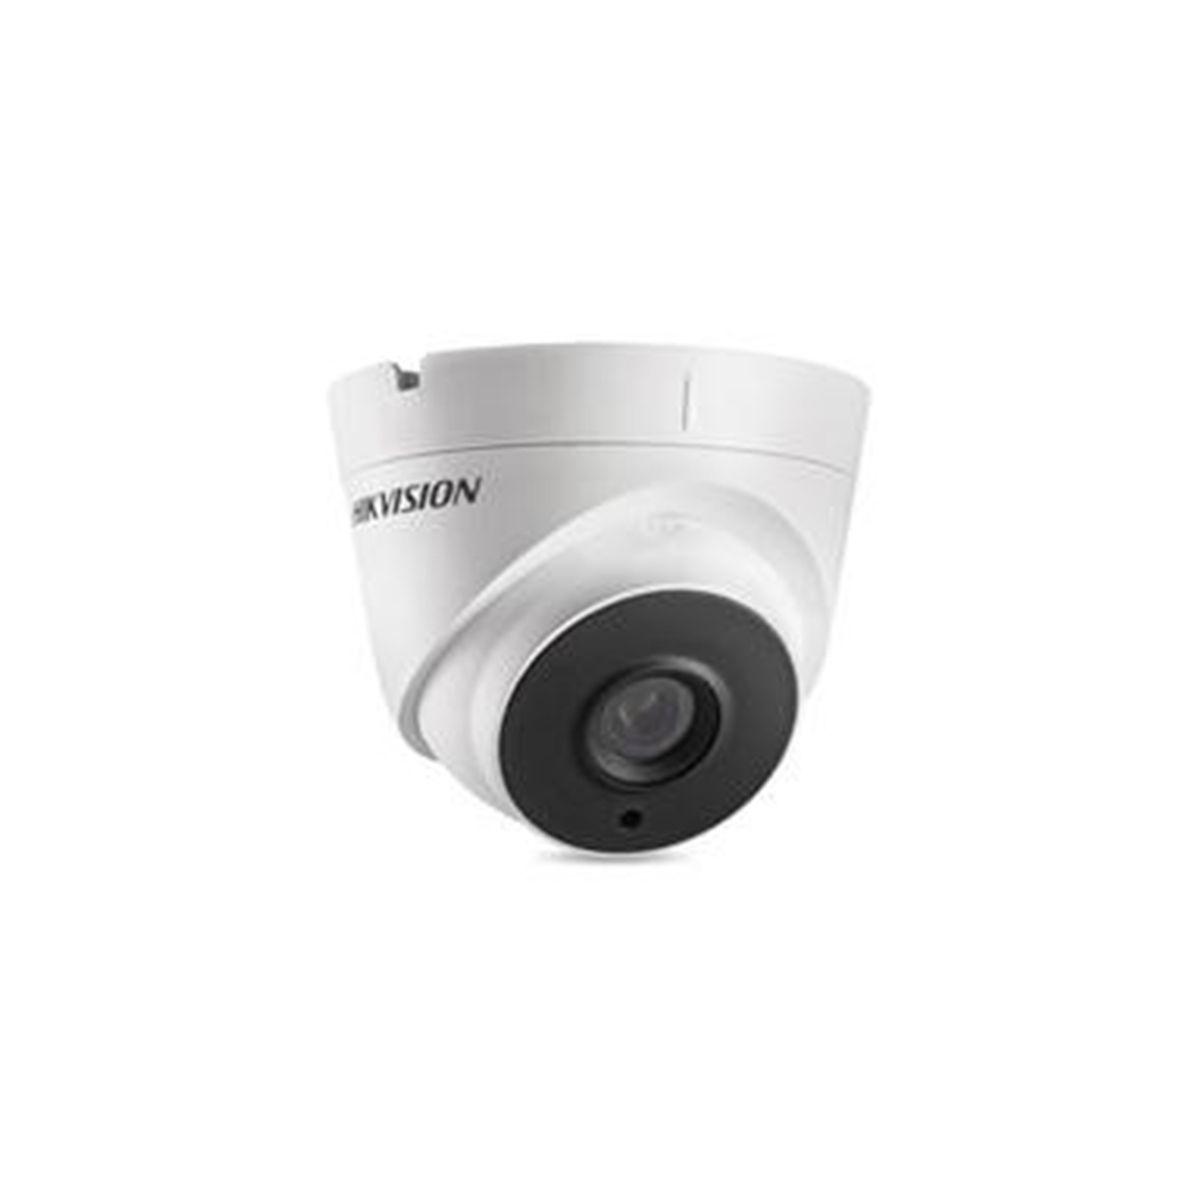 Cámara Hikvision Turbo HD Tipo domo DS-2CE56F1T-IT1